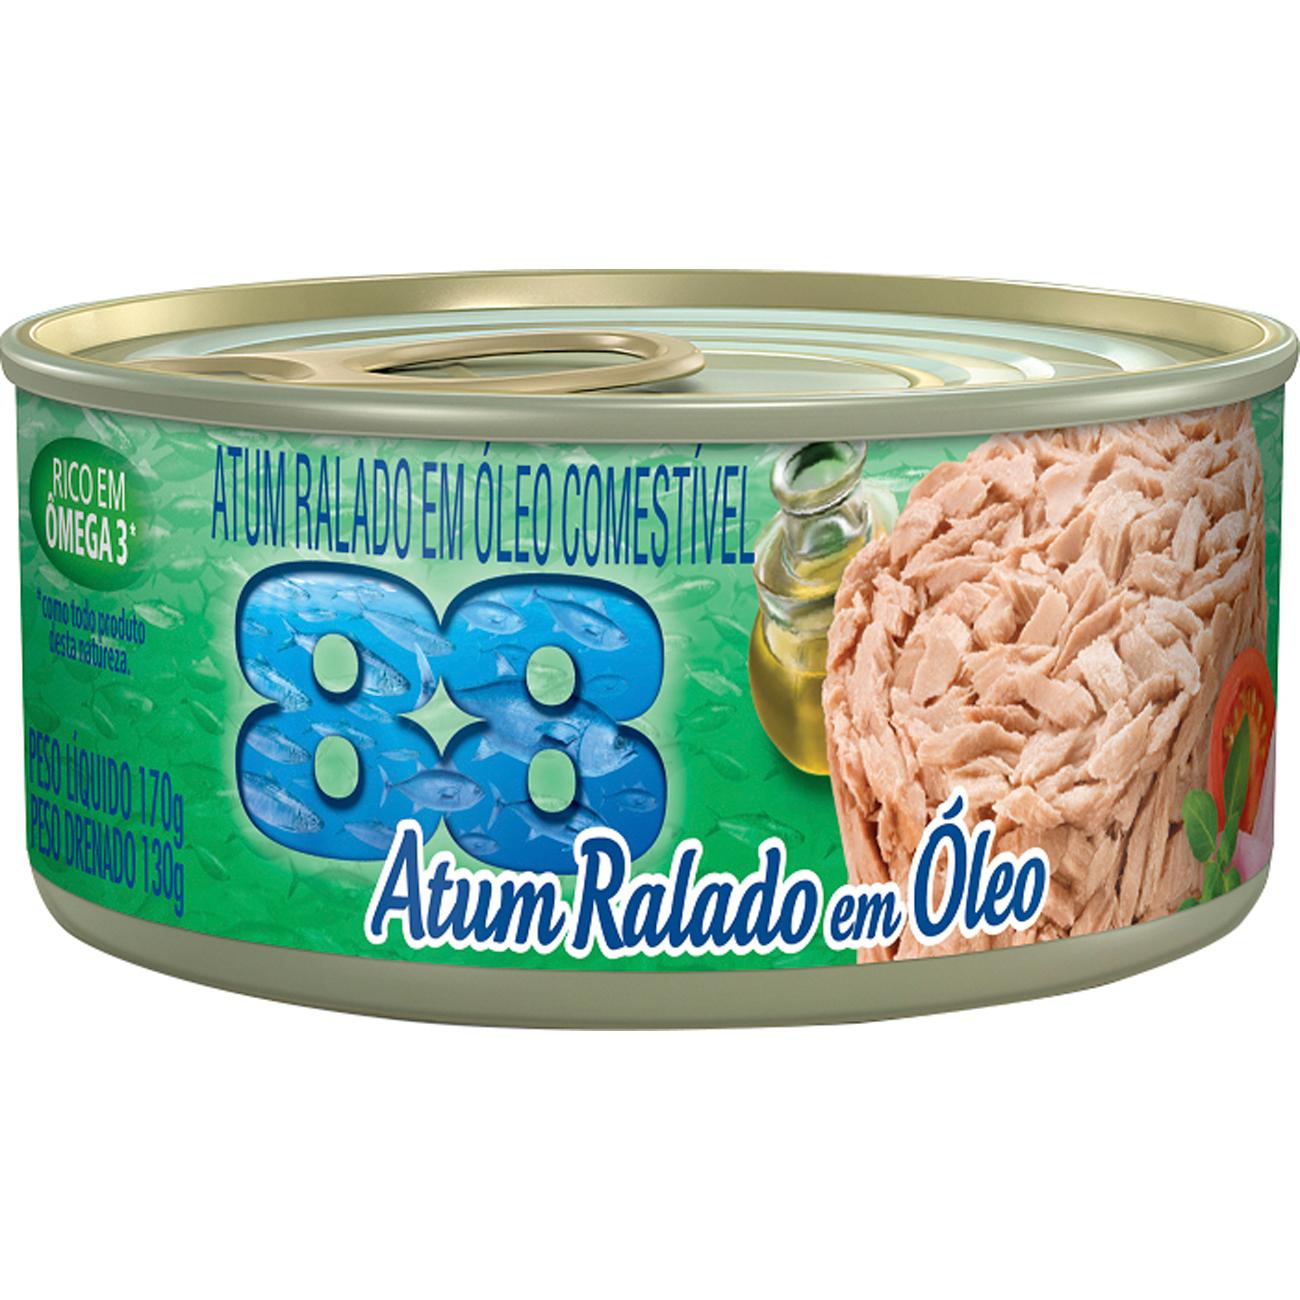 Atum 88 Ralado Oleo 170G